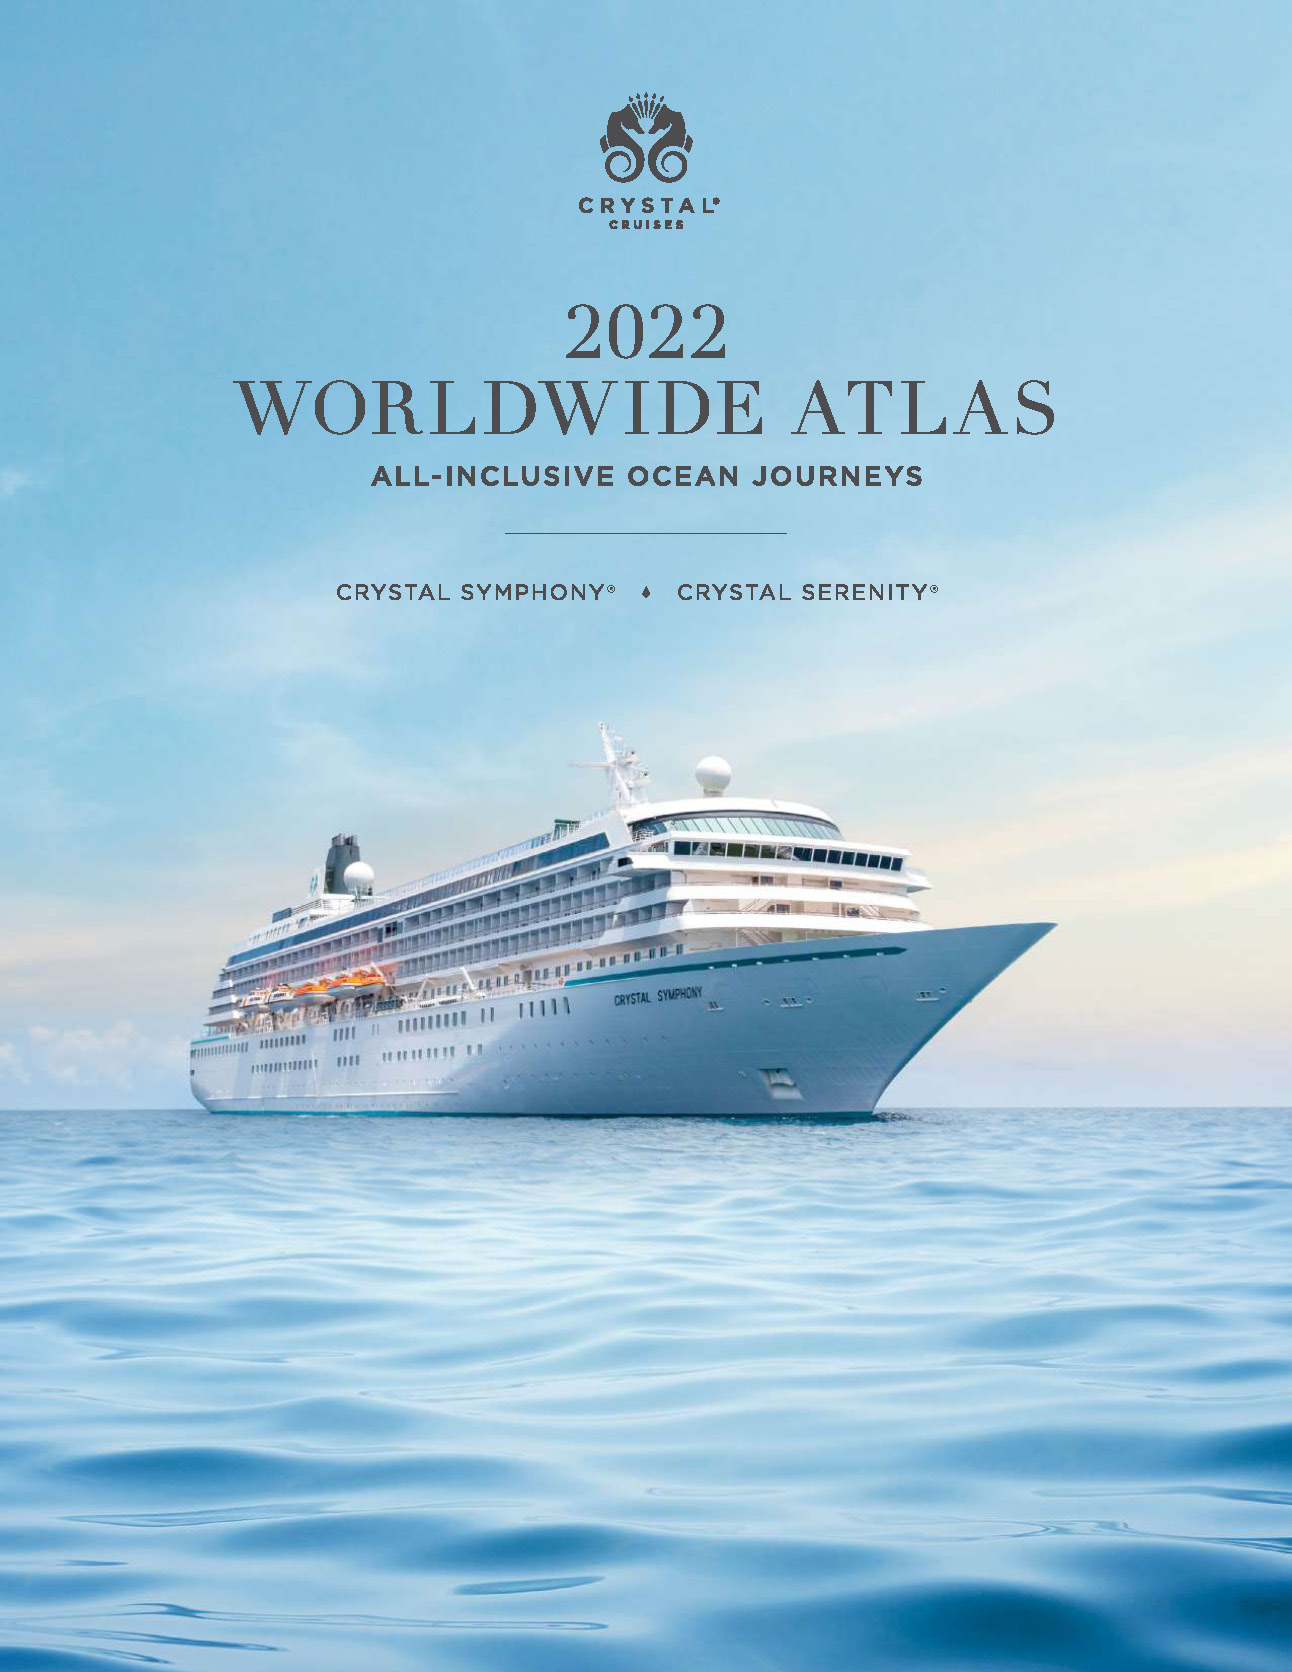 Catalogo Crystal Cruises 2022